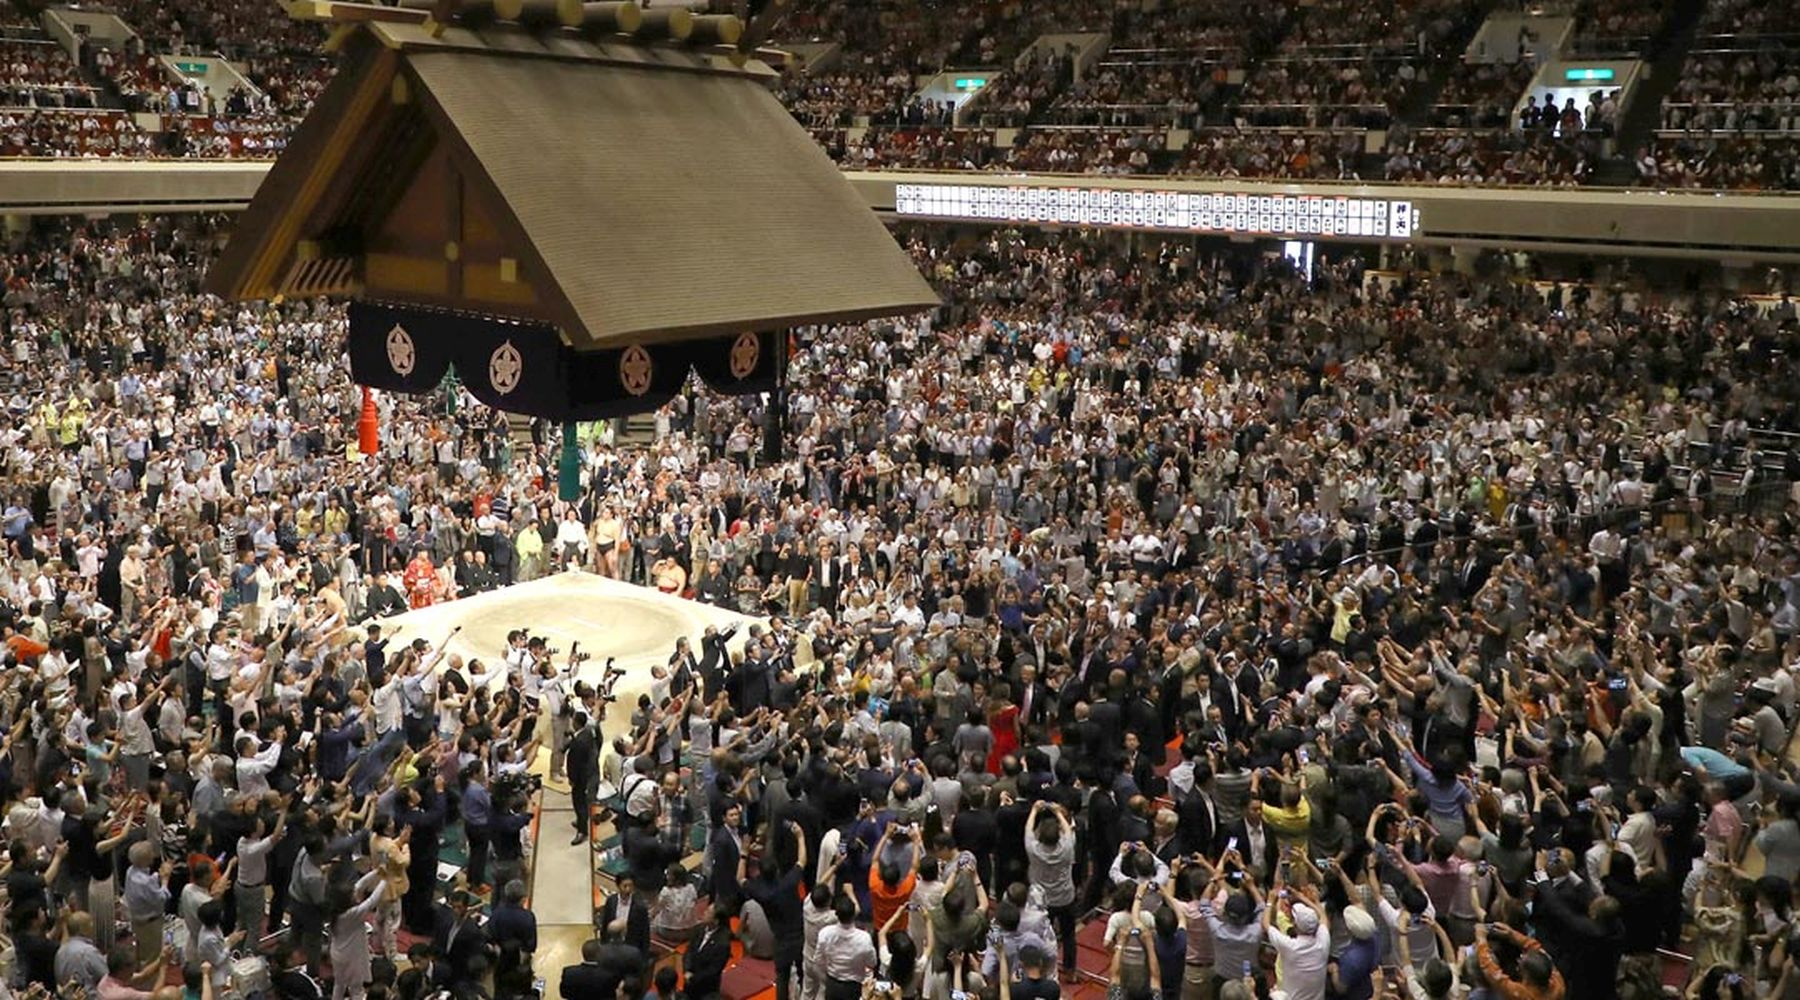 President Trump U.S. Cup to Japan Sumo Wrestler 003